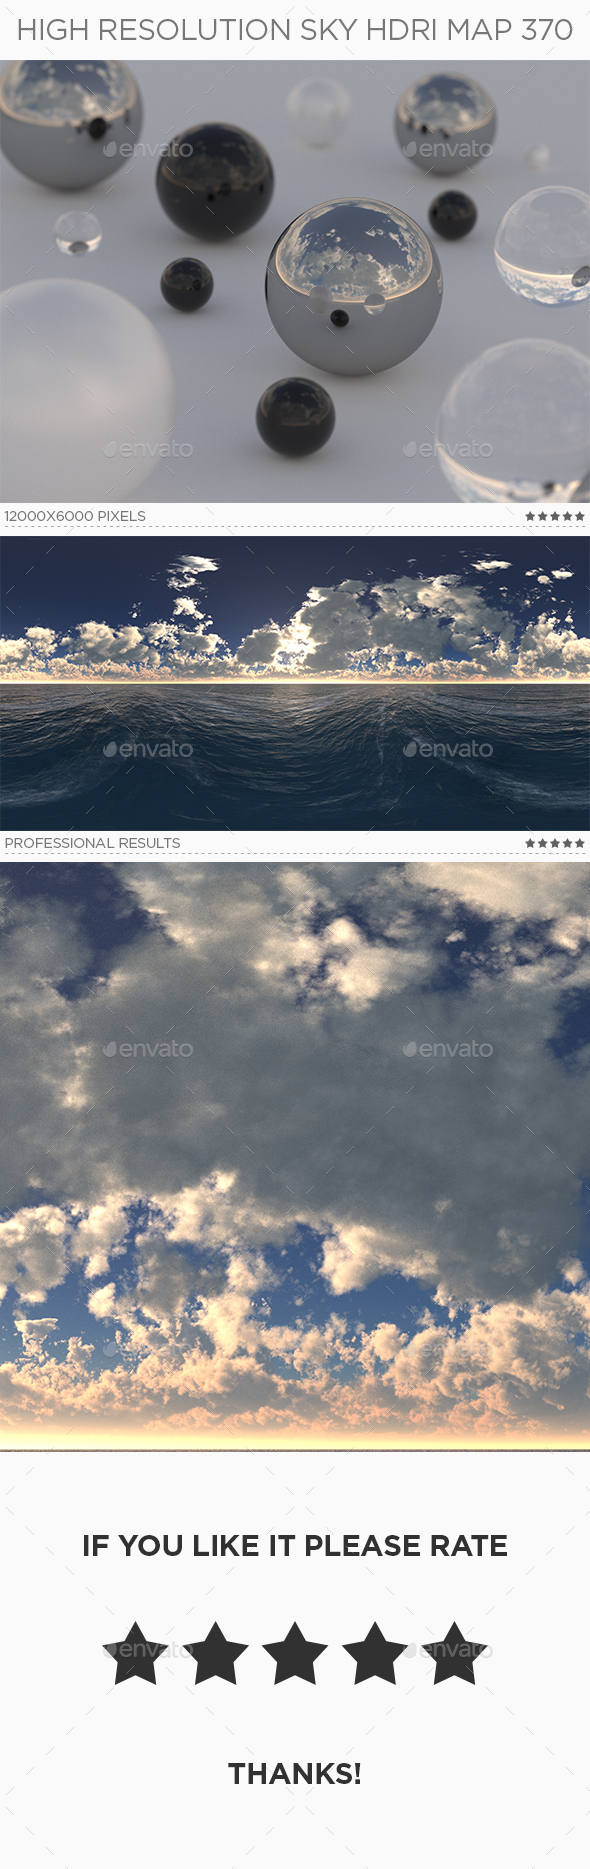 High Resolution Sky HDRi Map 370 - 3DOcean Item for Sale